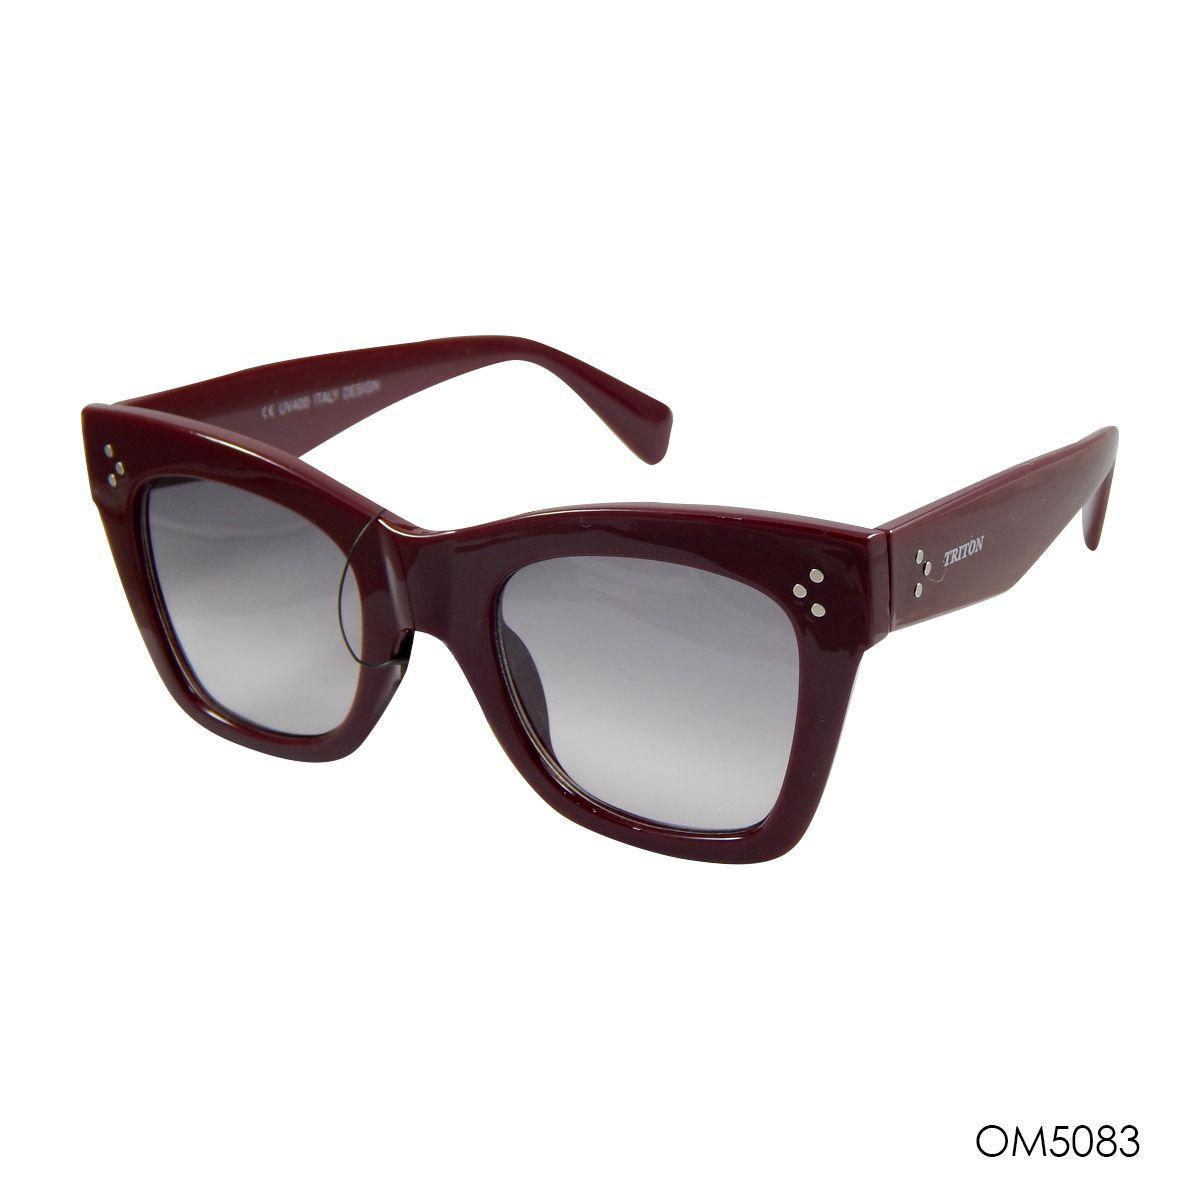 81297165d Oculos triton feminino retrô acetato om5083 - - Acessórios de moda ...